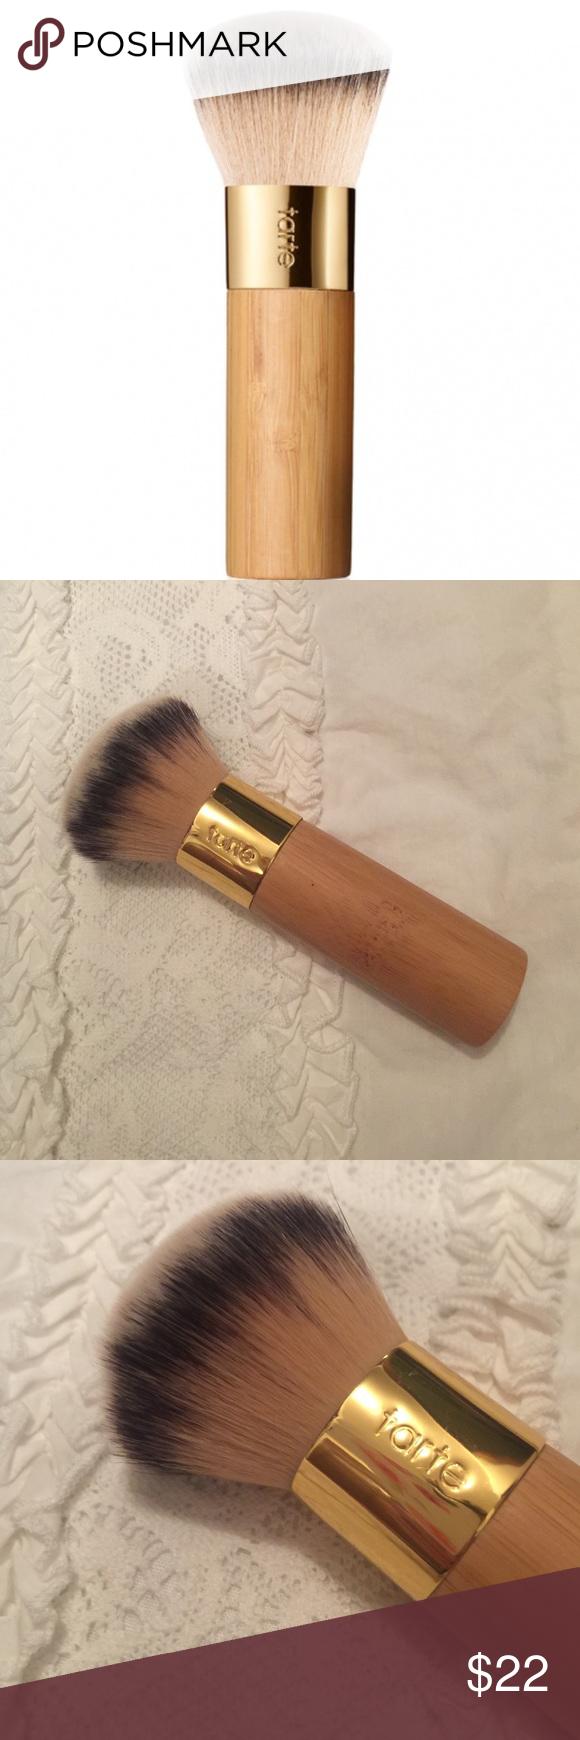 Tarte buffer bamboo brush Tarte makeup brushes, Bamboo brush